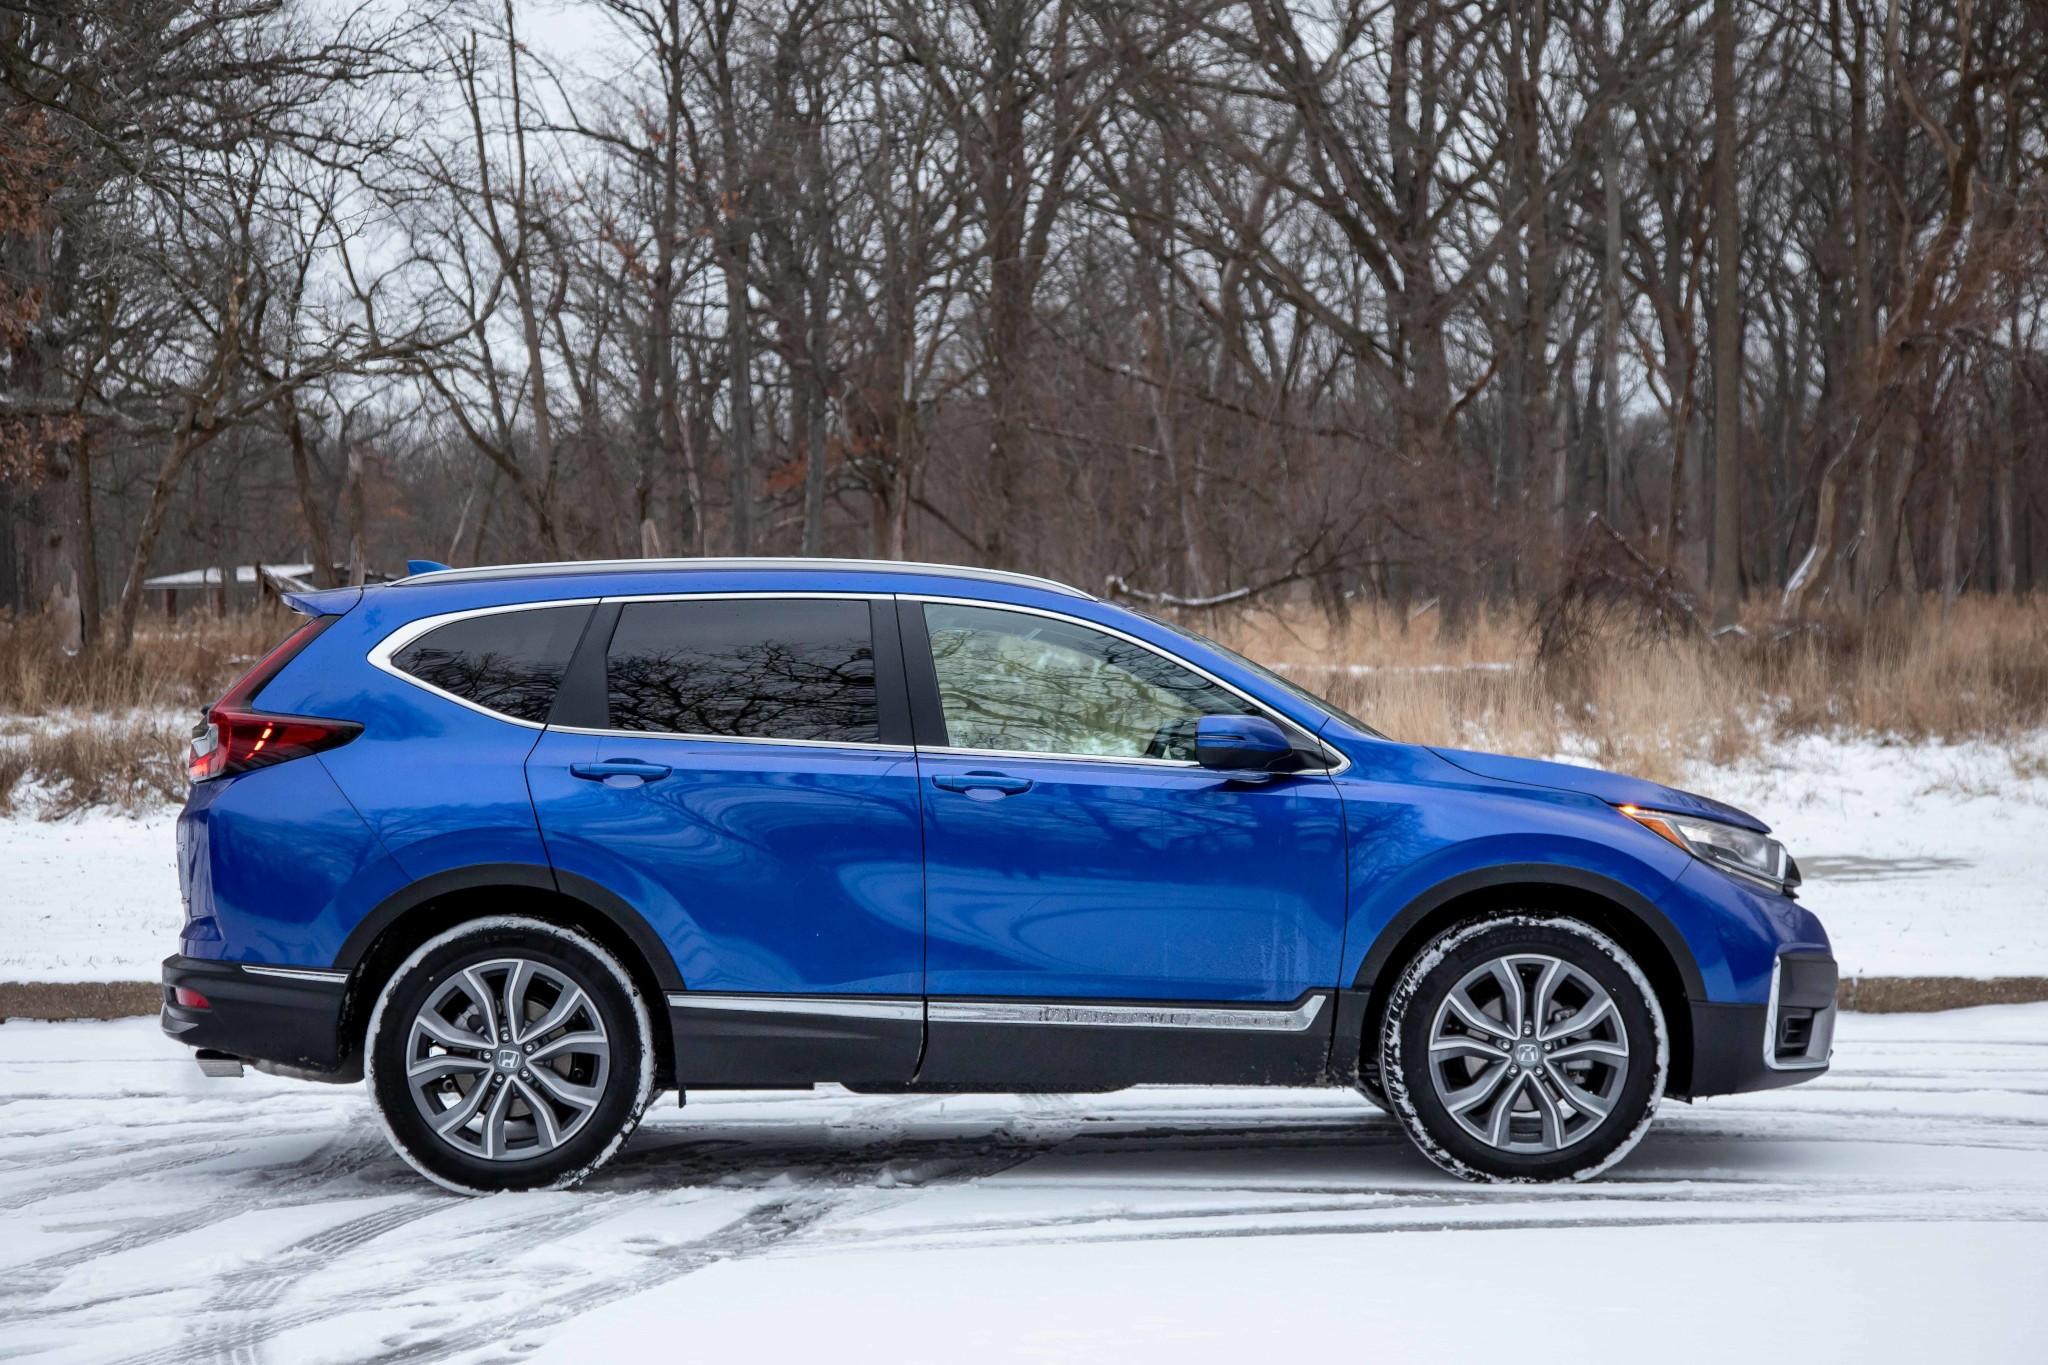 honda-cr-v-2020-04-blue--exterior--profile.jpg